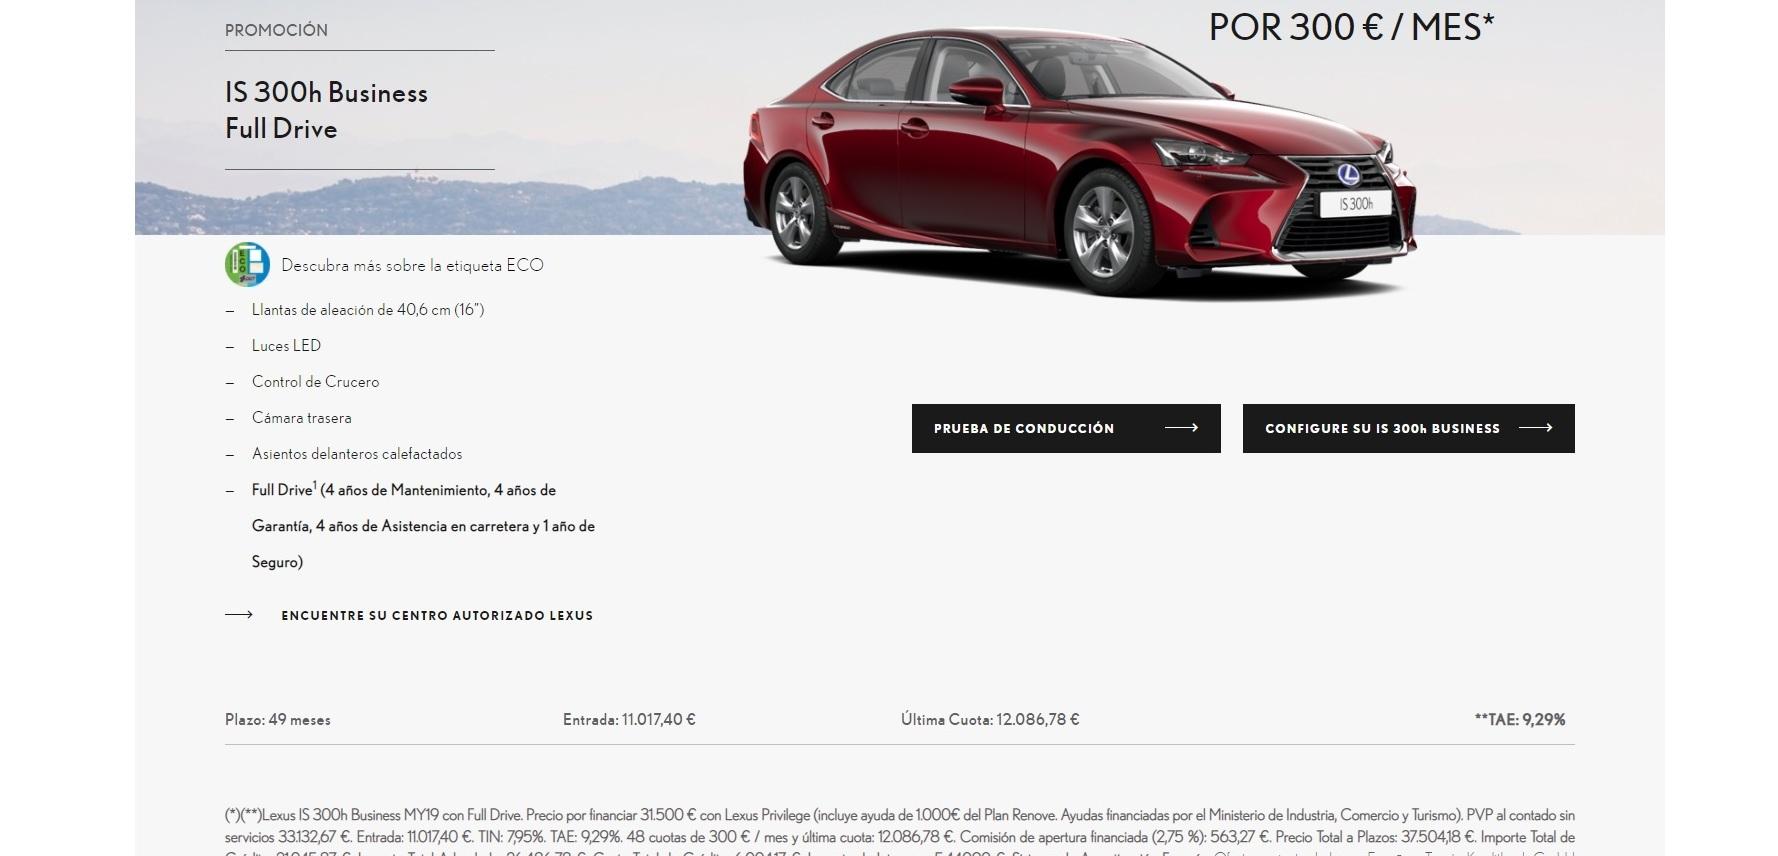 Financiar Compra Coche Nuevo Oferta Lexus Is 300h